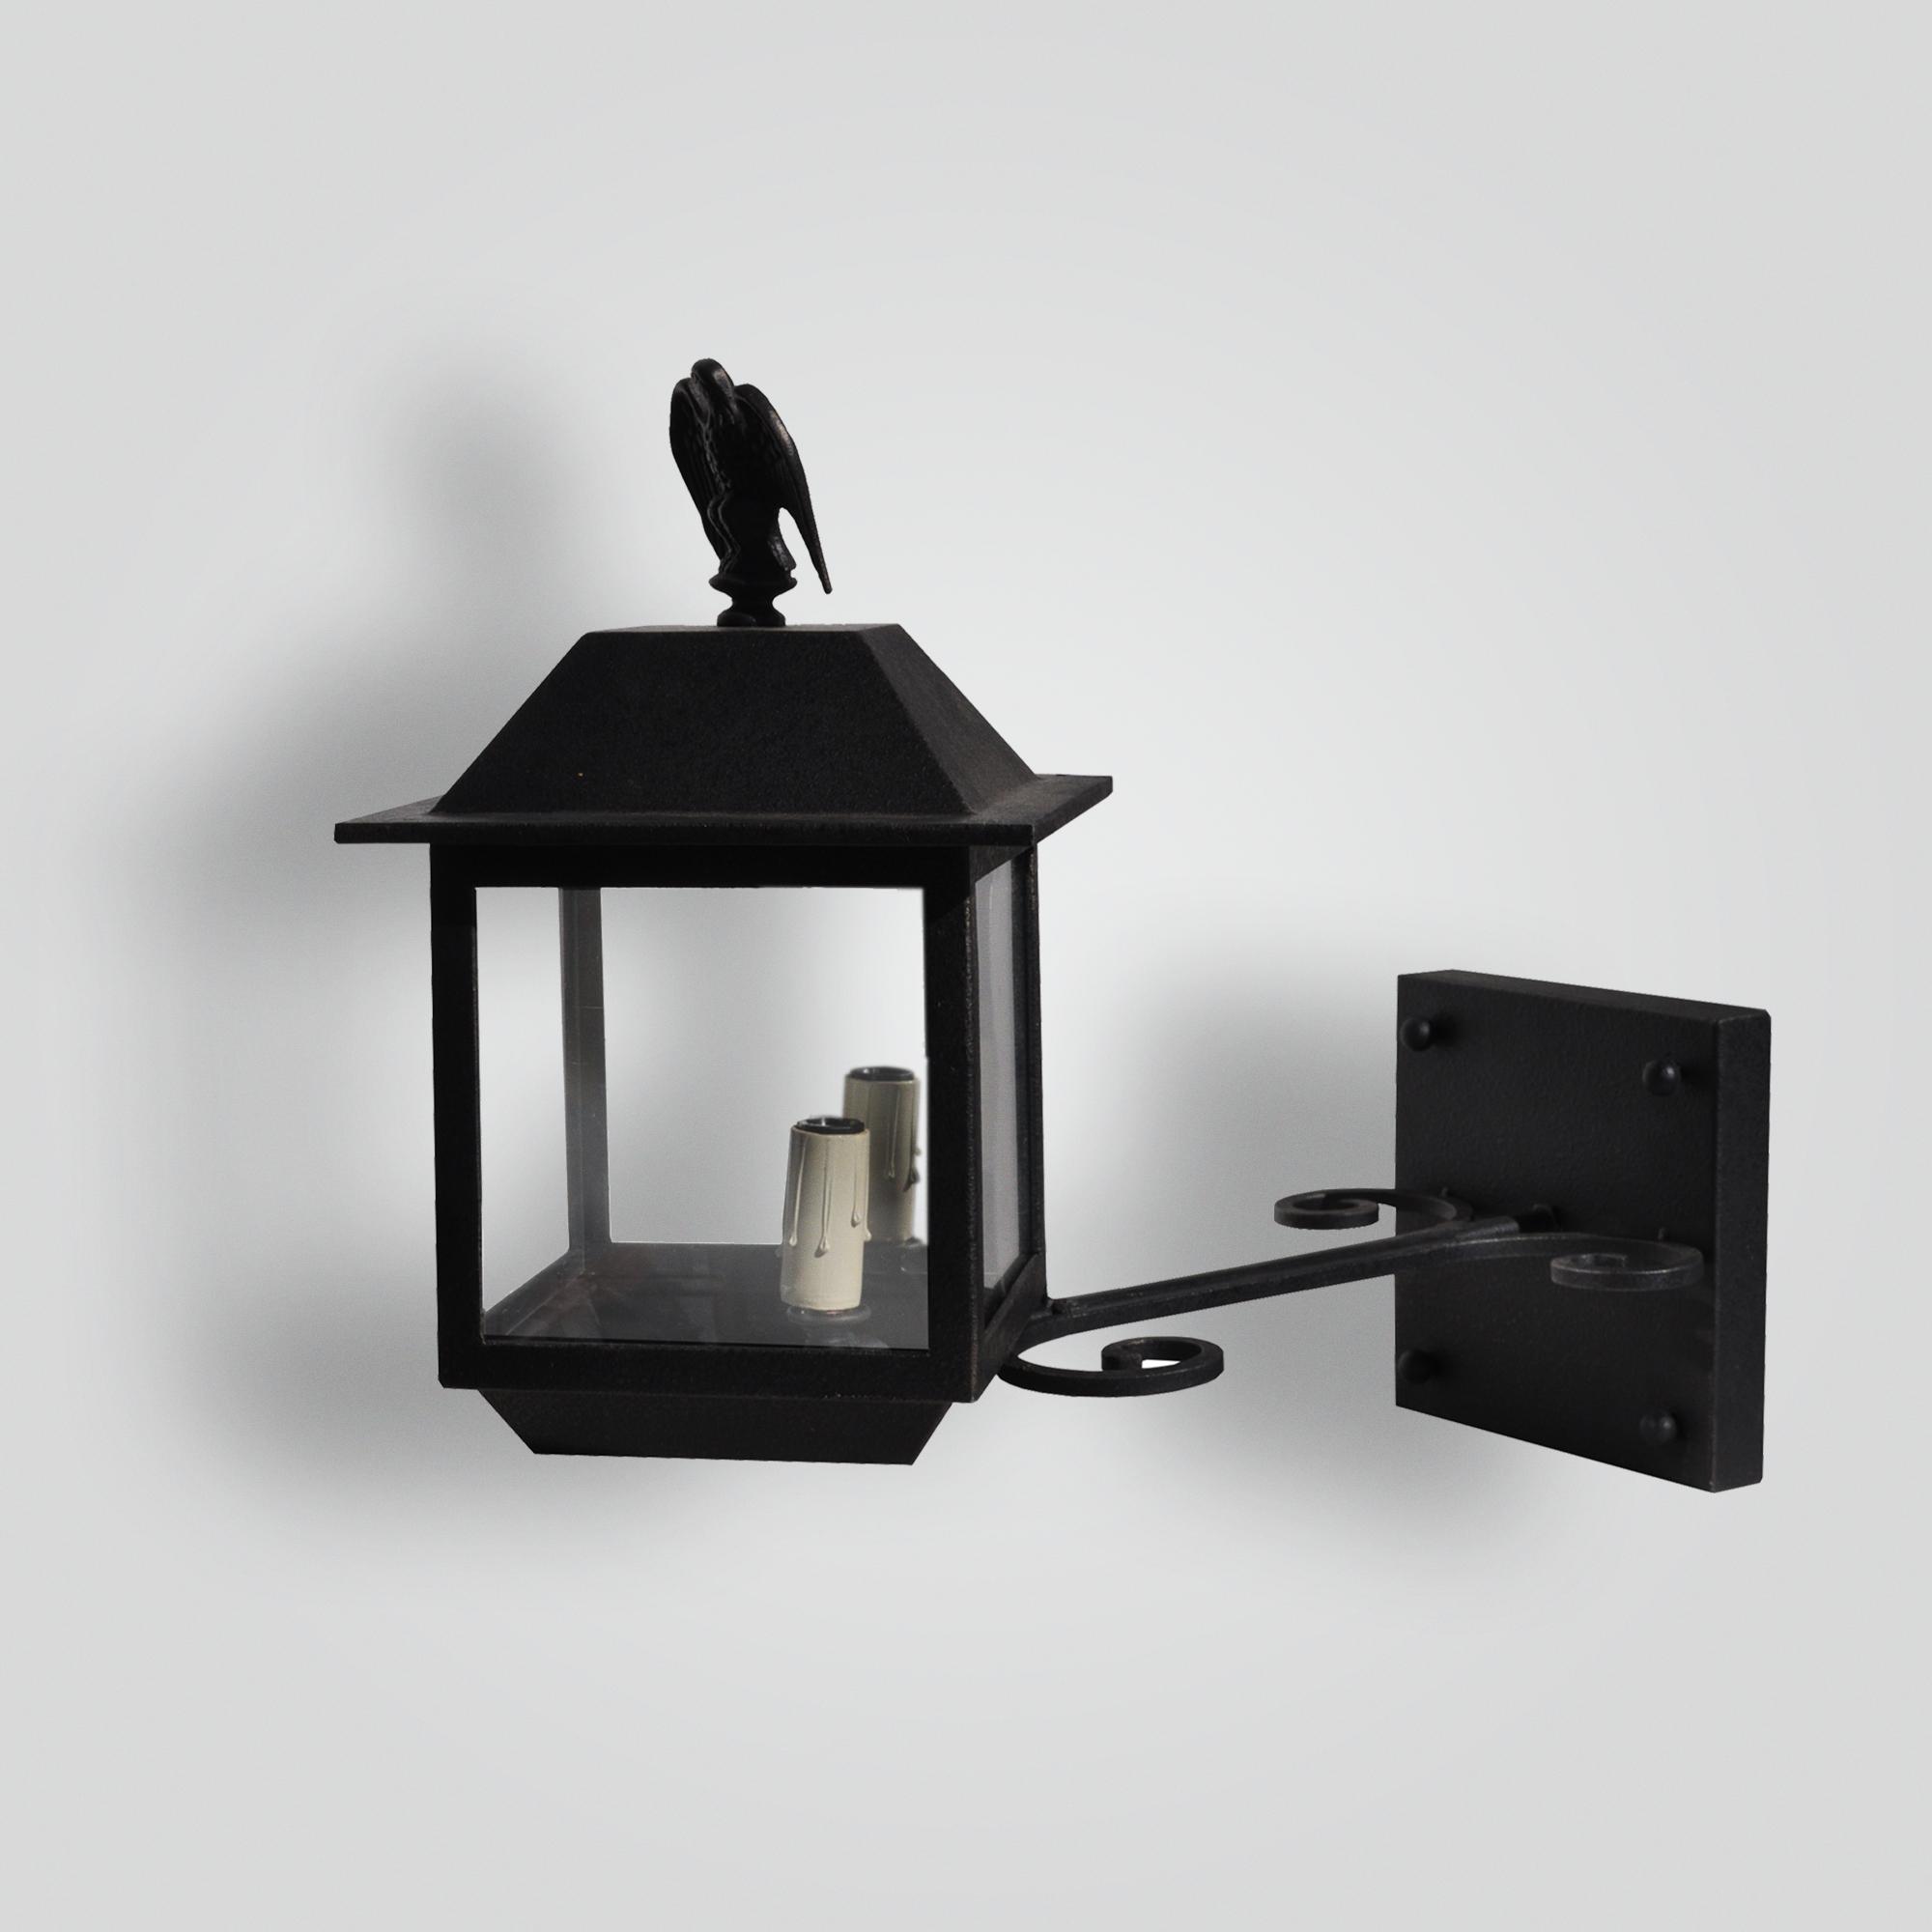 17cb1-ir-w-ba Eagle Wall Light – ADG Lighting Collection